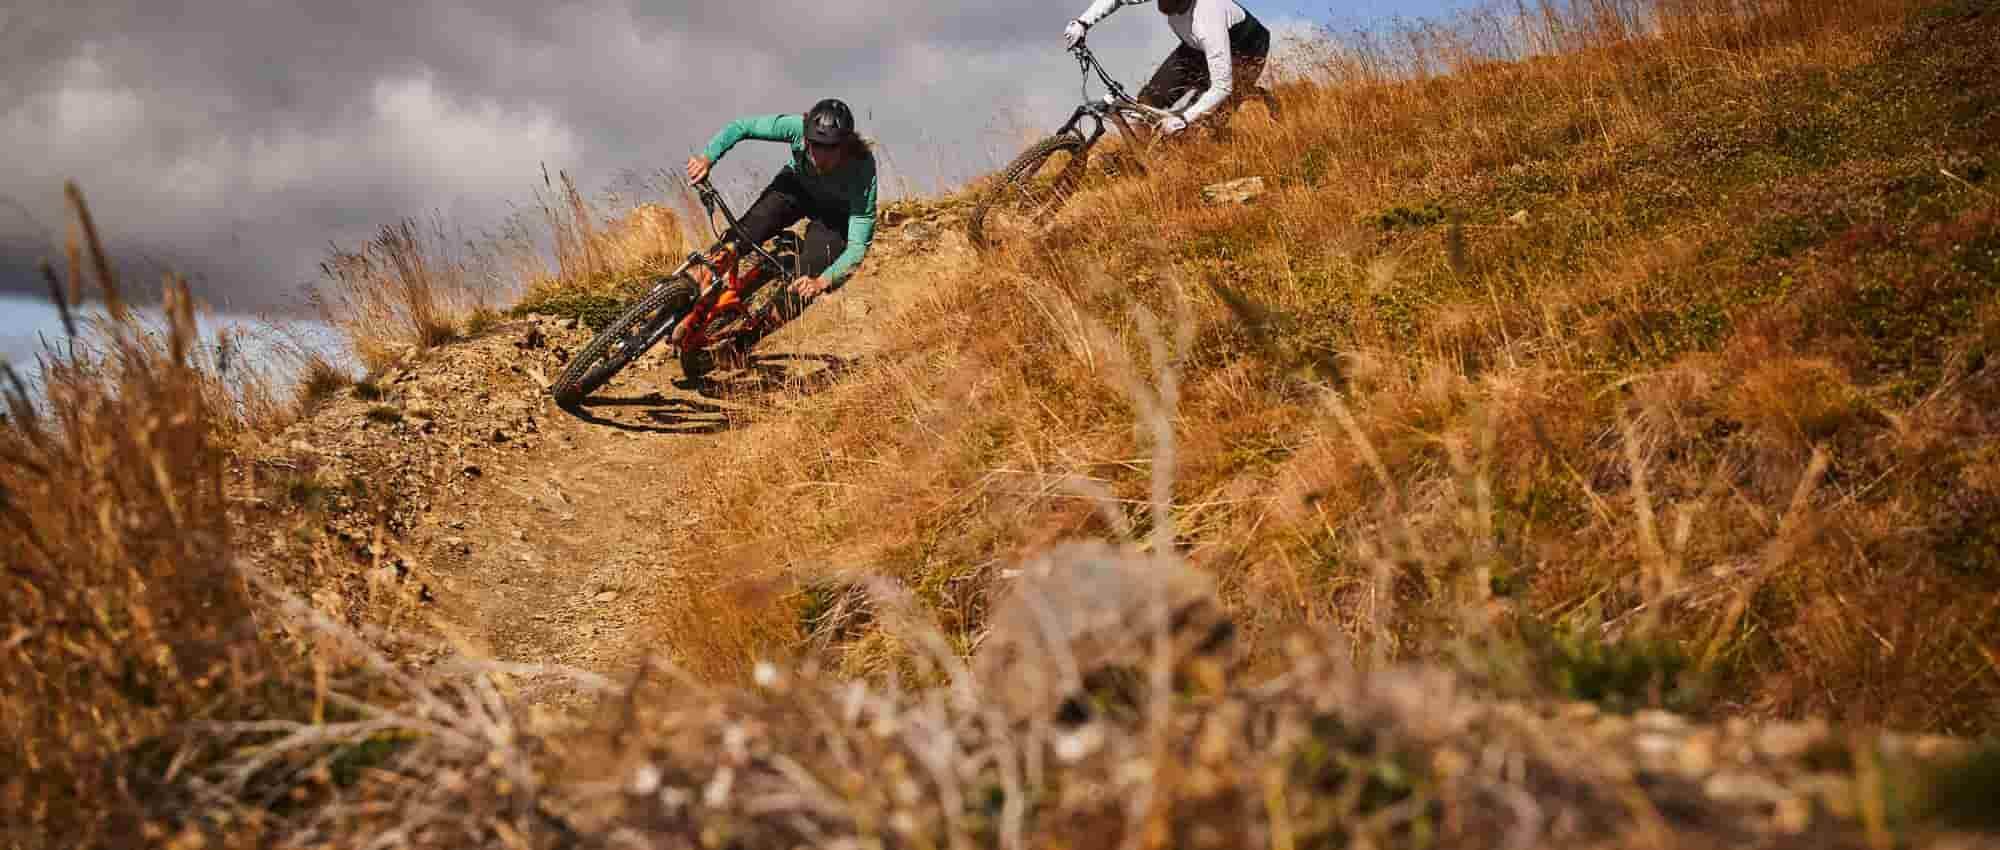 hardtail mountain biking